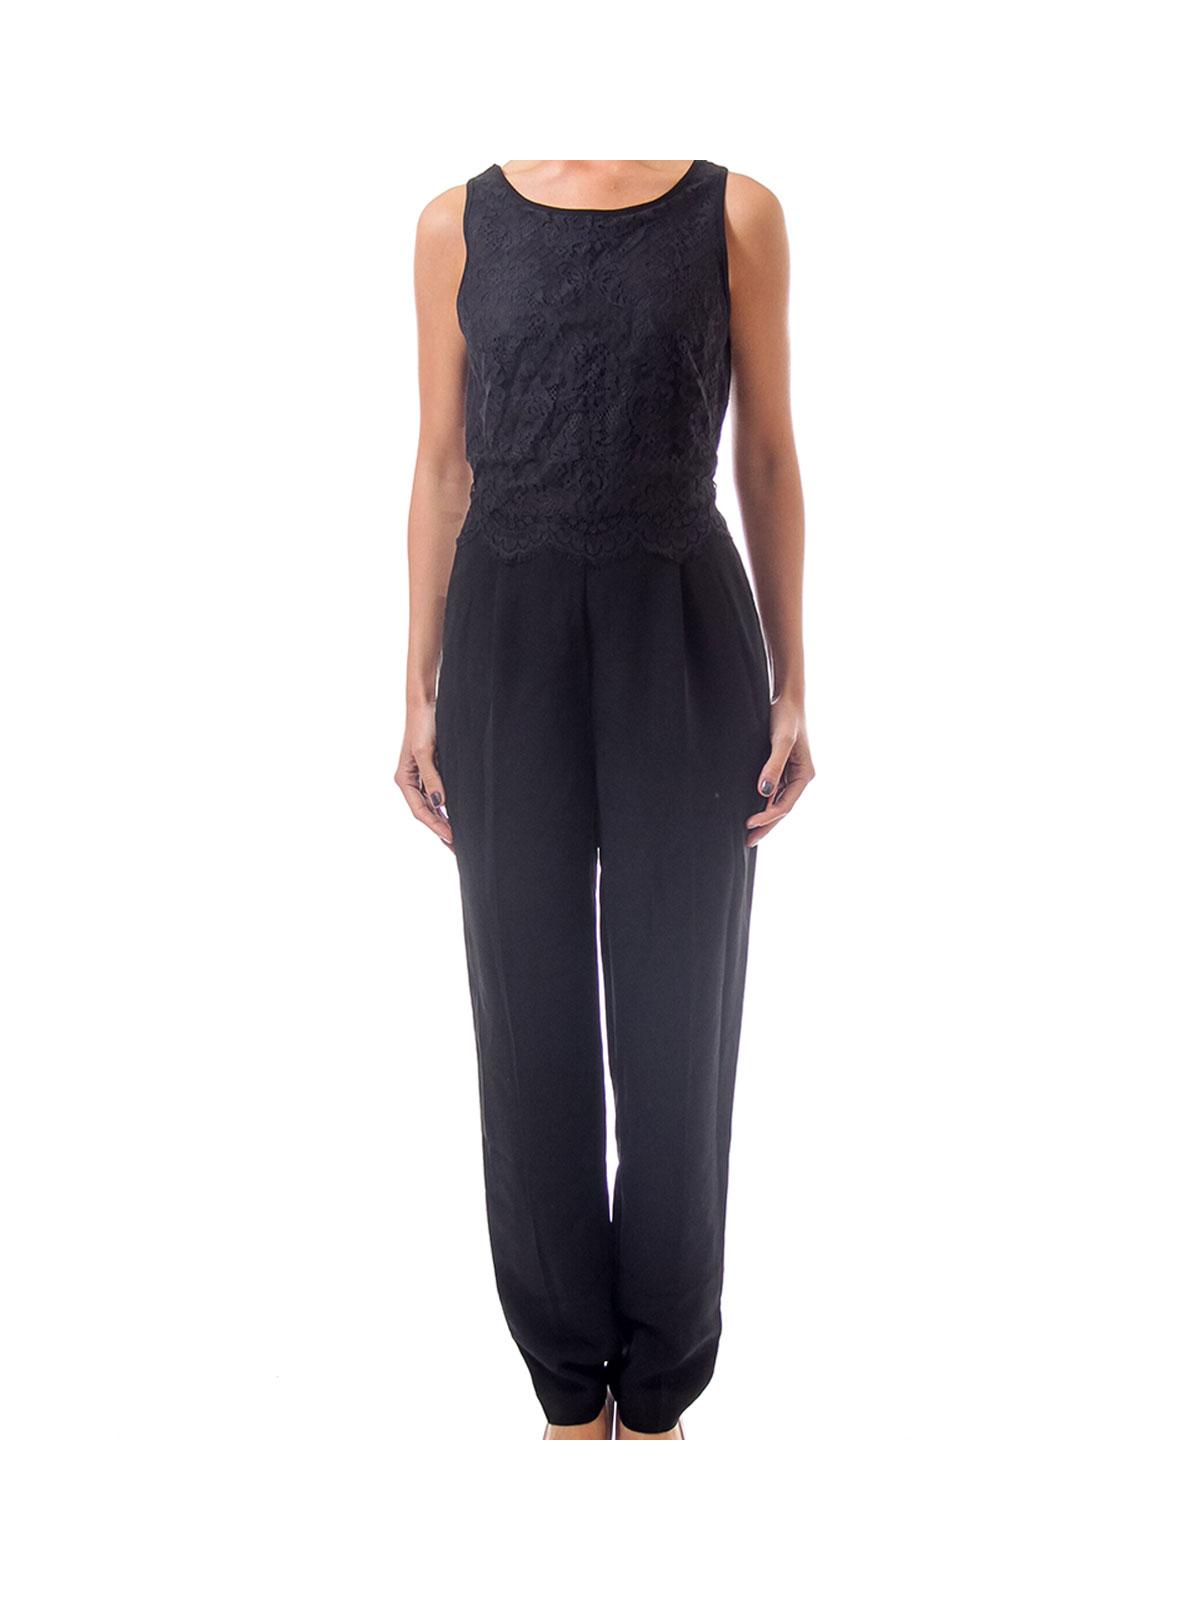 Black Jumpsuit with Lace Top